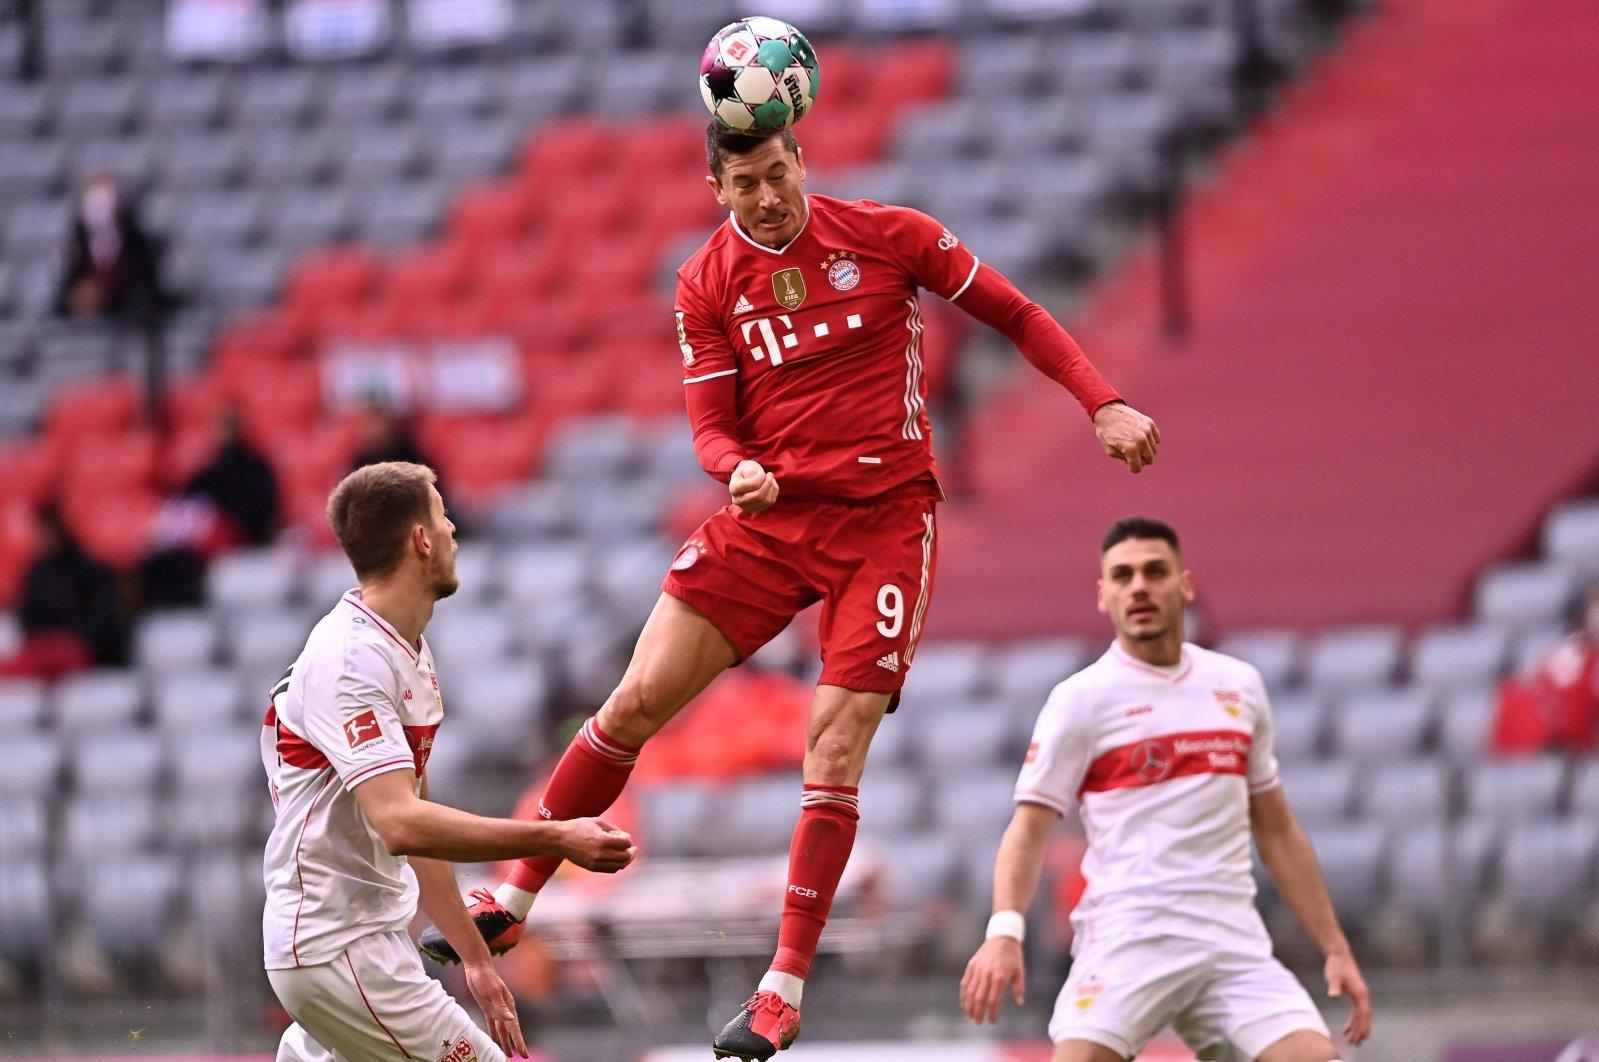 Bayern forward Robert Lewandowski (C) scores a goal against VfB Stuttgart in a Bundesliga match in Munich, Germany, March 20, 2021. (EPA Photos)